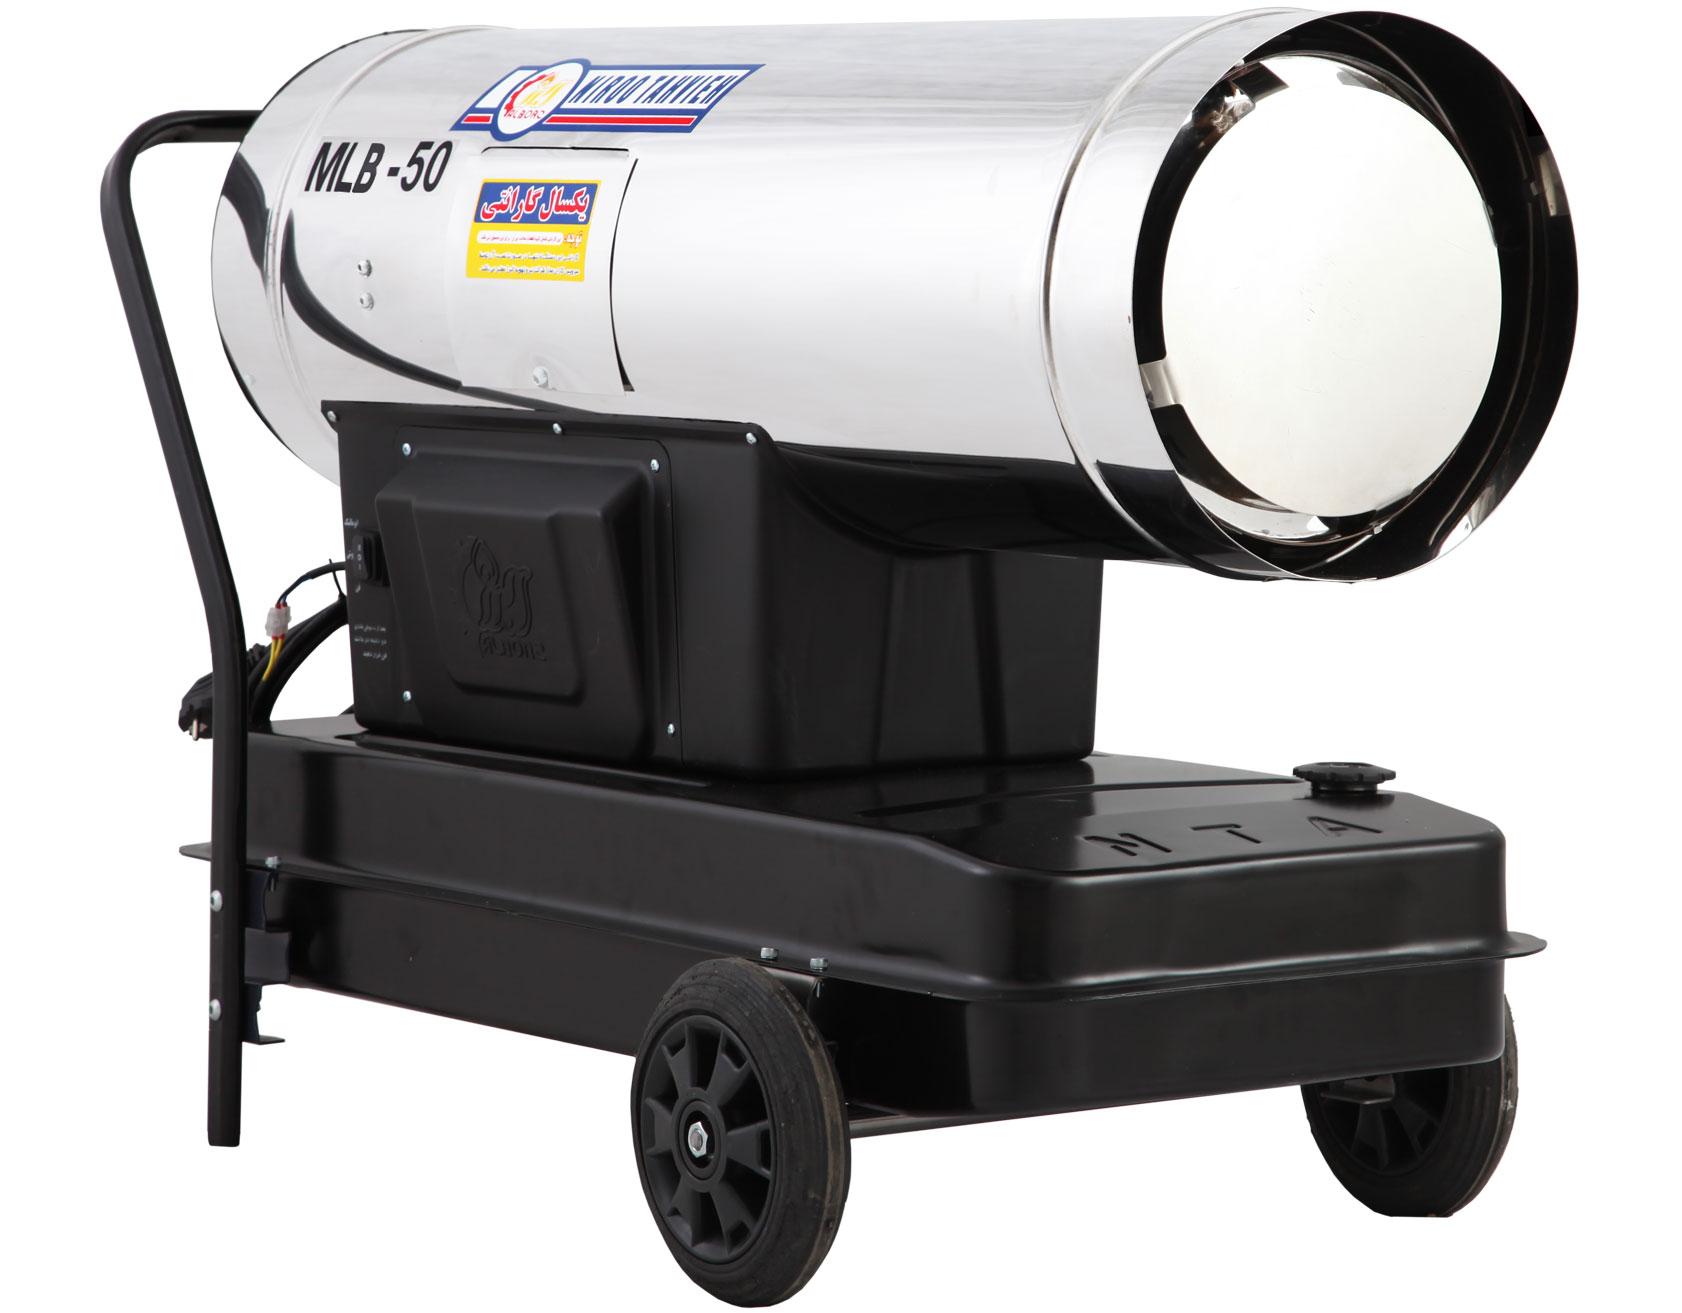 MLB-50 Jet Heater